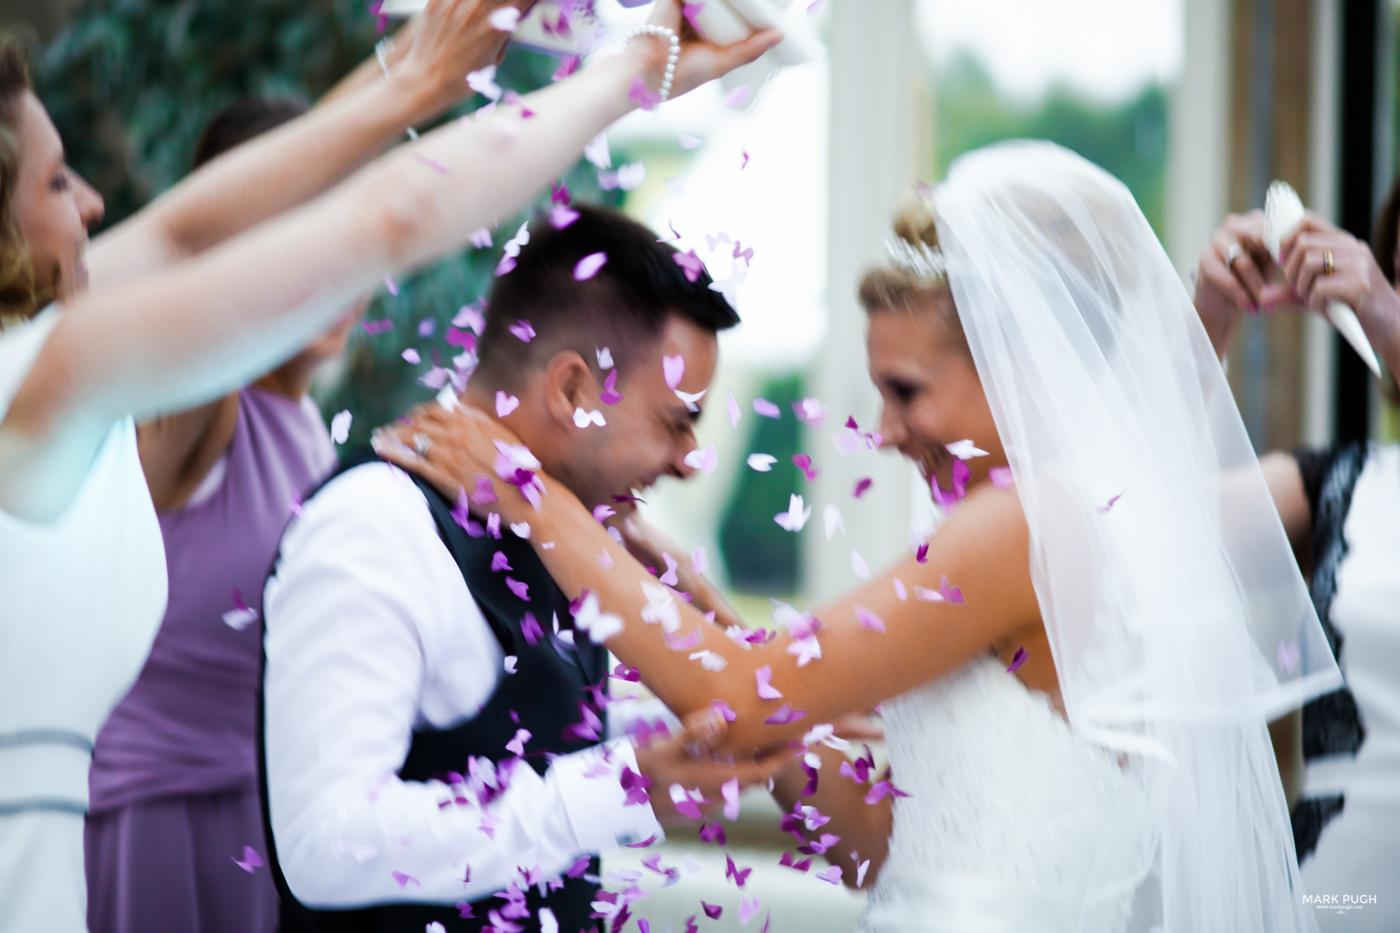 088 Wedding Photography Award winning Wedding Photographer and Videographer Mark Pugh www.markpugh.com.JPG